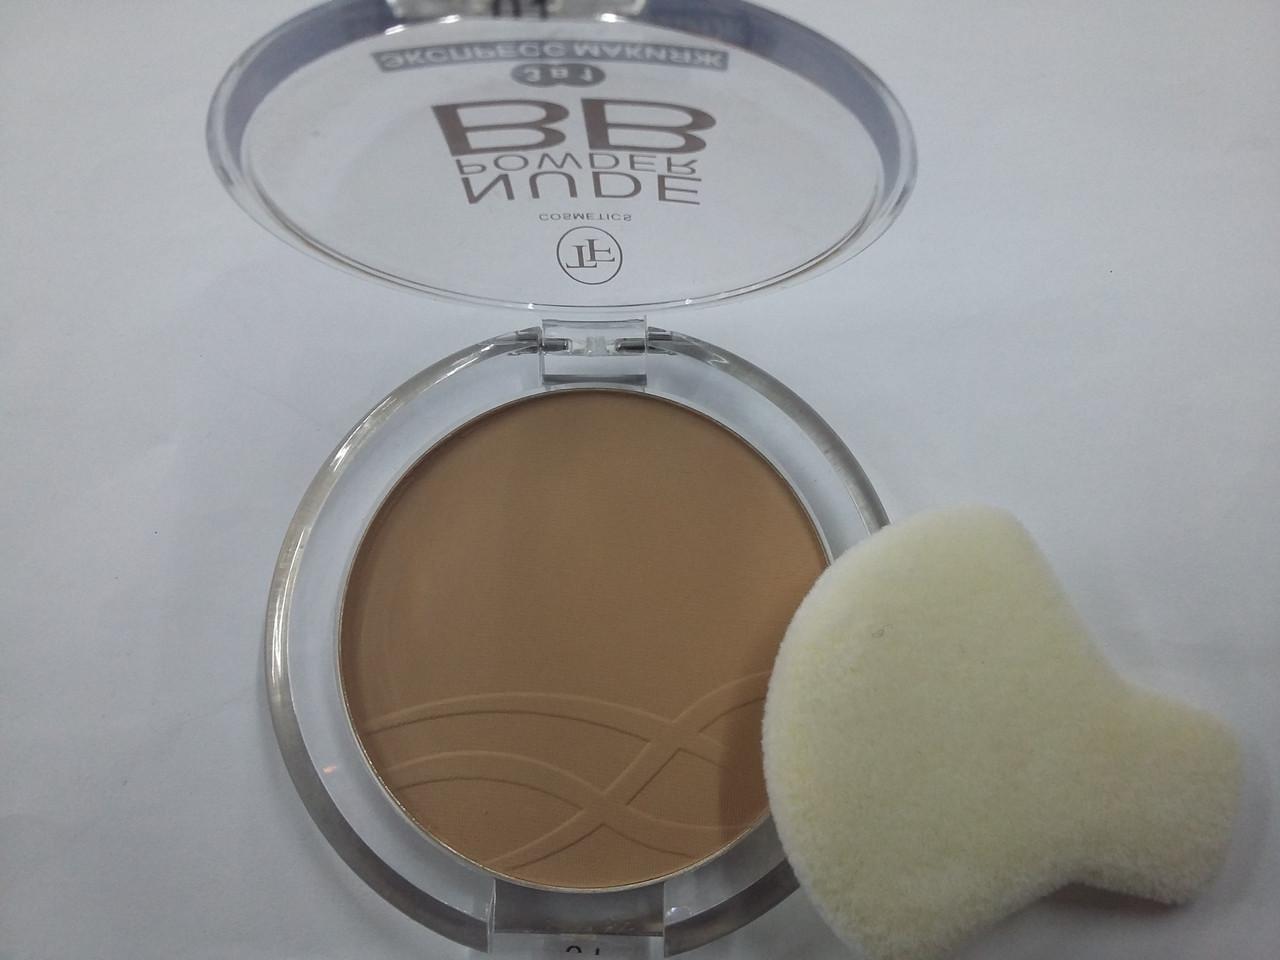 Компактная пудра для лица TF NUDE BB POWDER №01